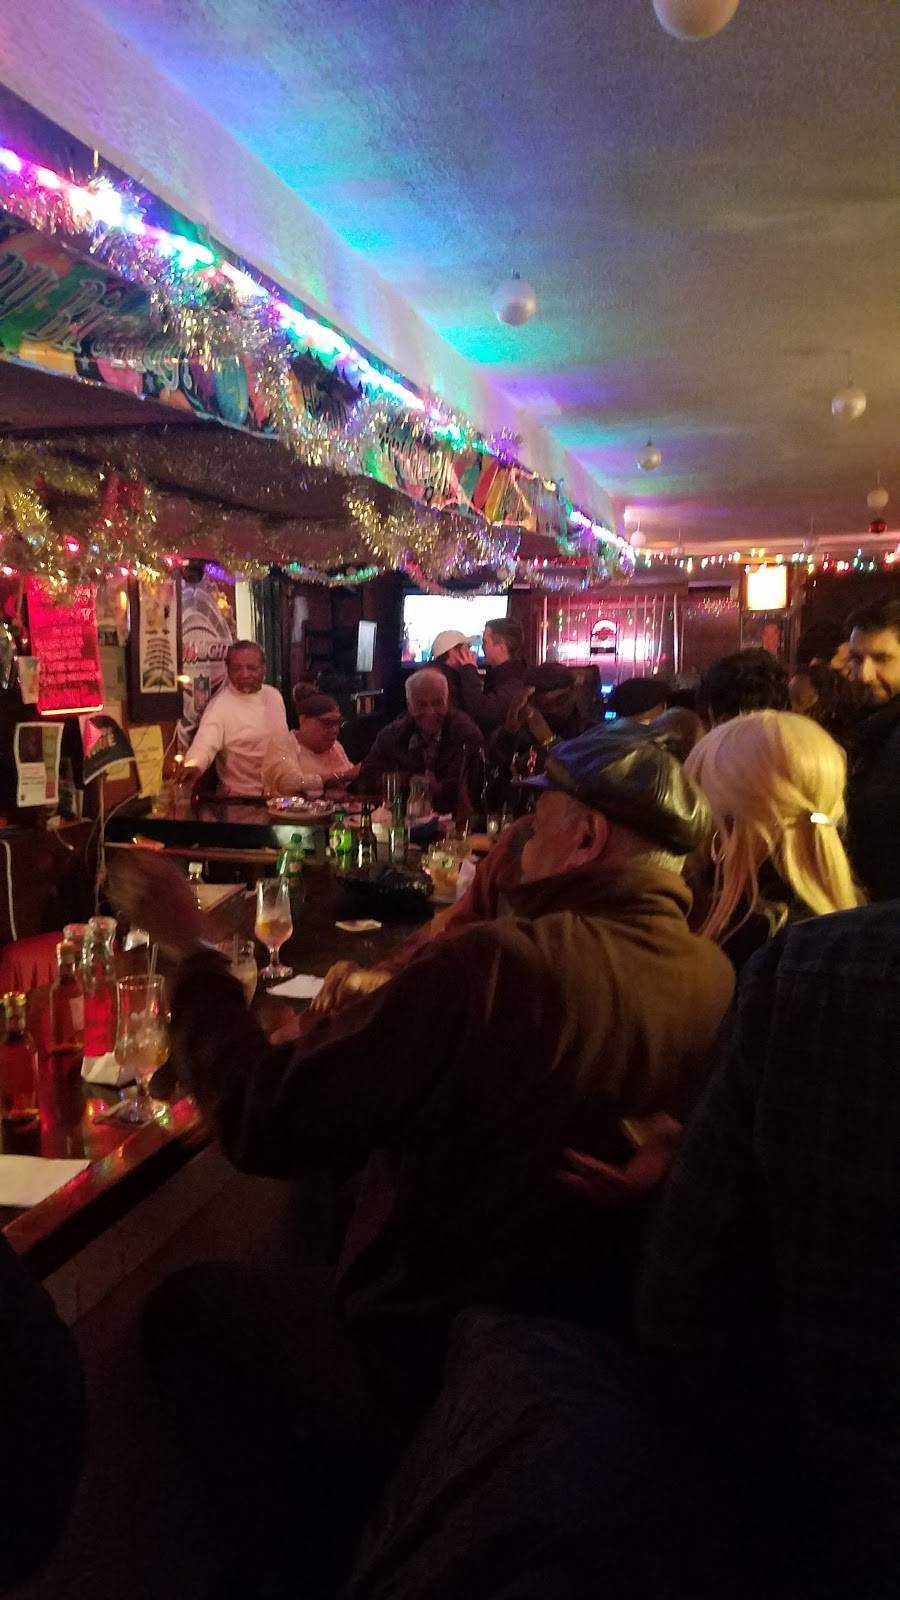 Tiptop Bar & Grill   restaurant   432 Franklin Ave, Brooklyn, NY 11238, USA   7188579744 OR +1 718-857-9744